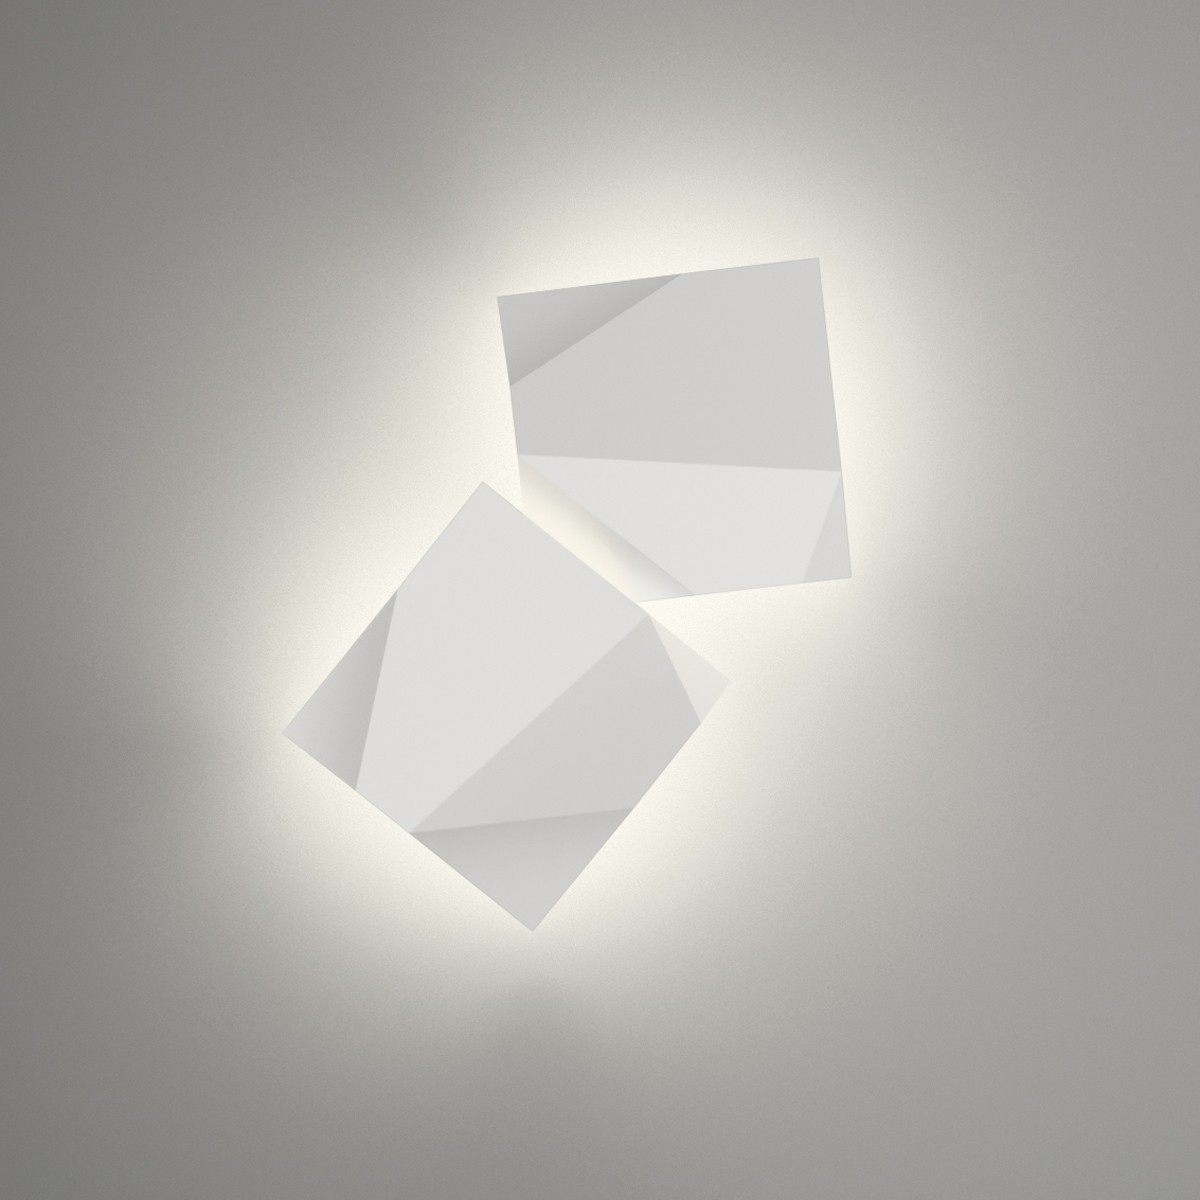 Vibia Origami 4504 Wandleuchte, 2-flg., weiß matt